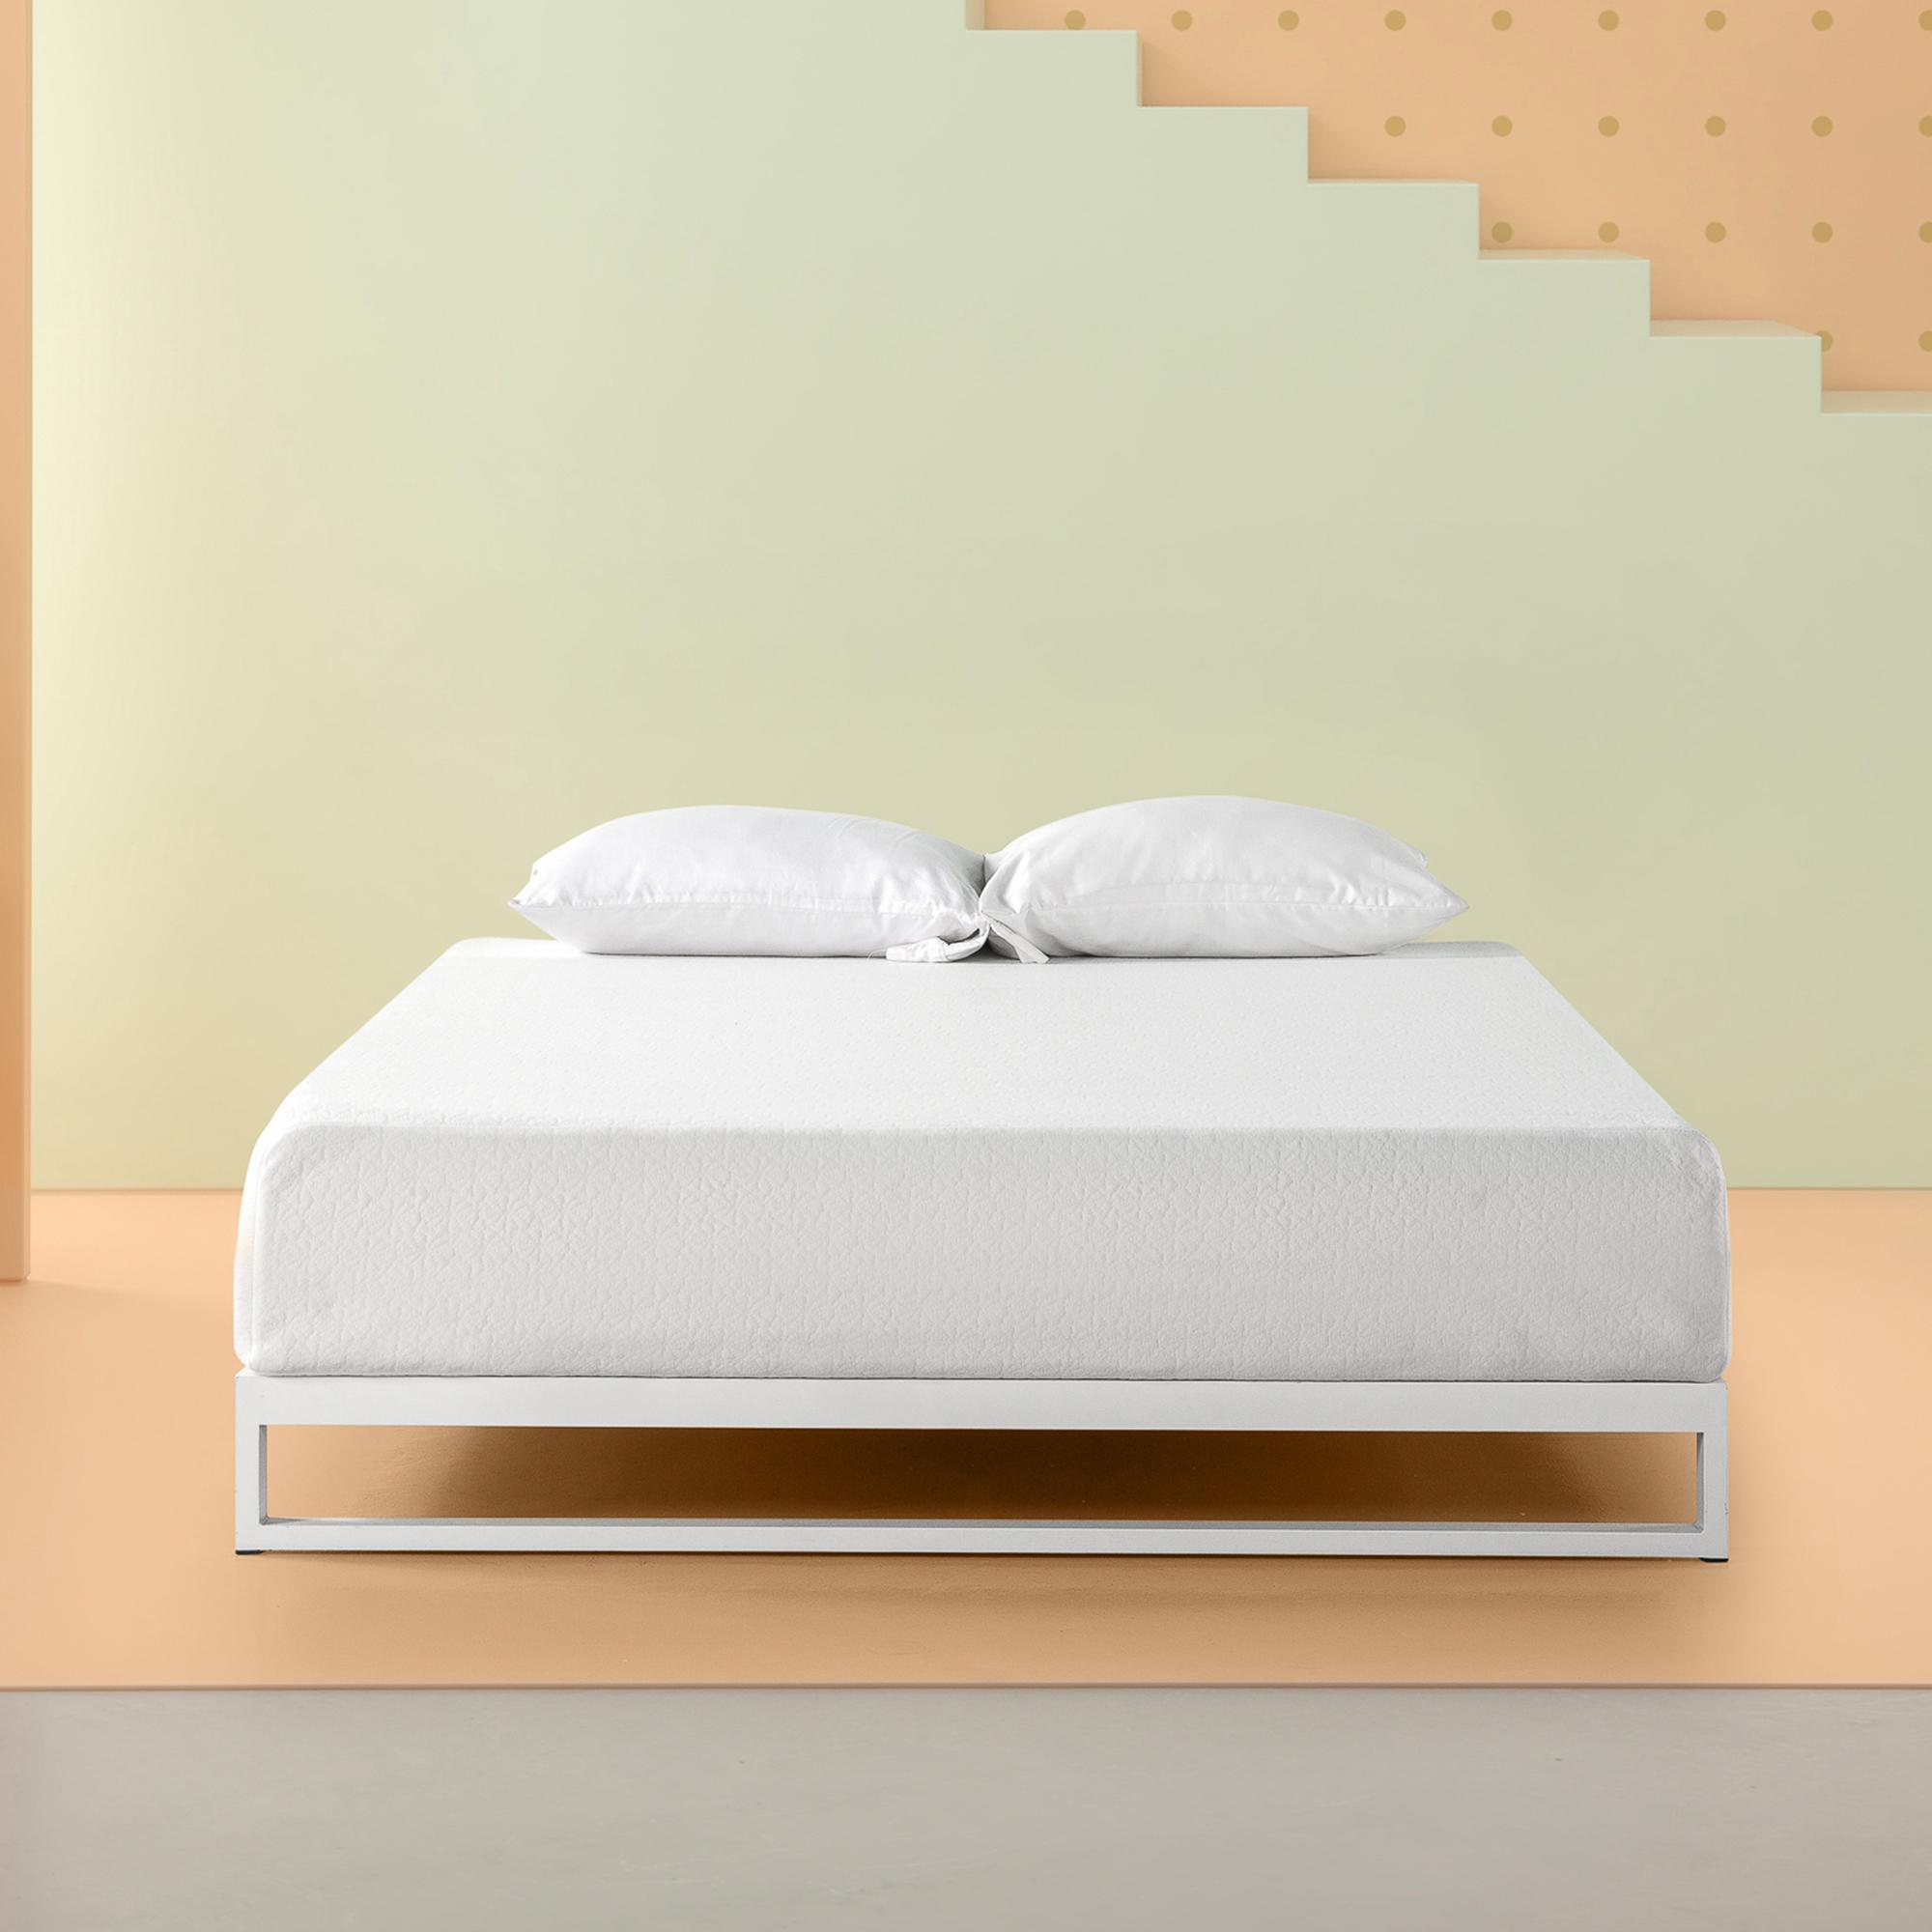 Studio Home Premium Green Tea Memory Foam Mattress Reviews